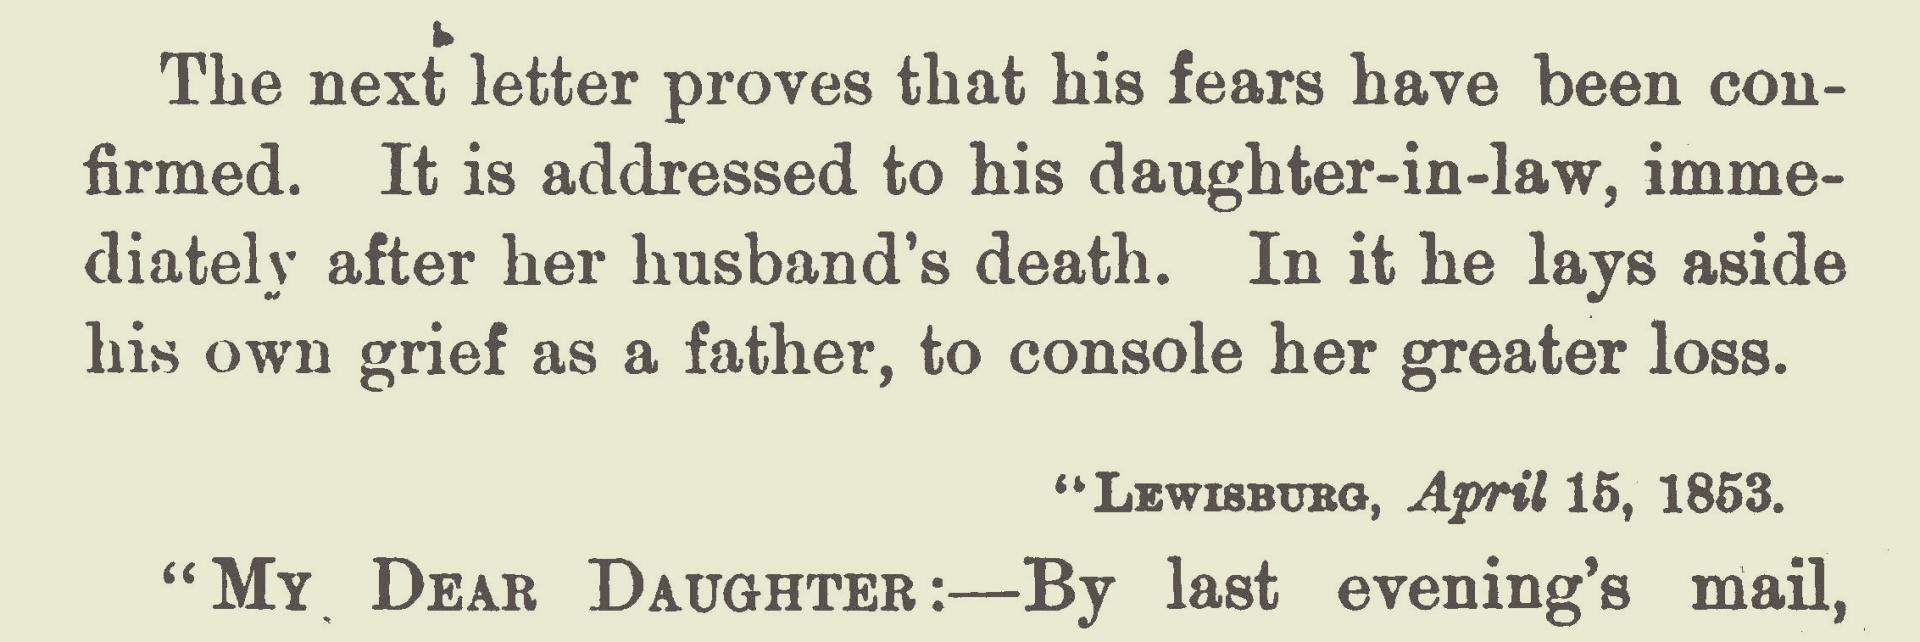 McElhenney, John, April 15, 1853 Letter to Martha McElhenney Title Page.jpg